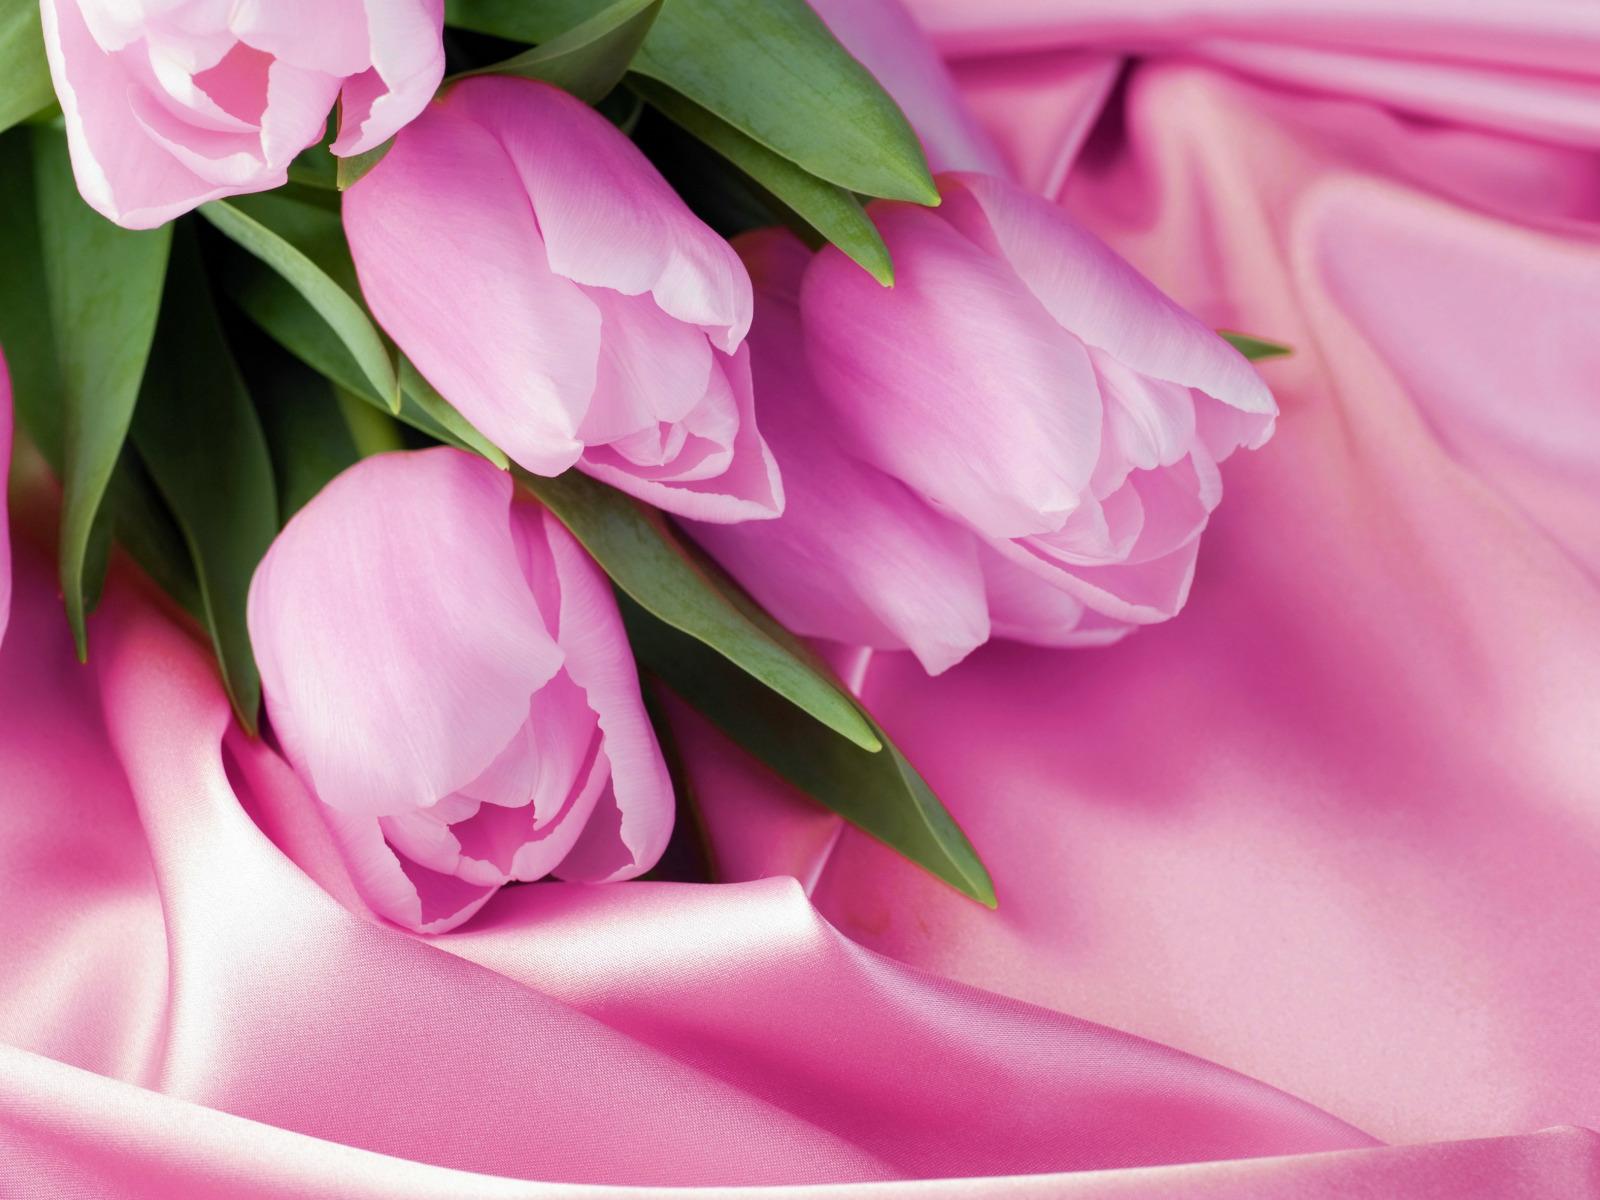 Фоны для открыток цветы, работнику